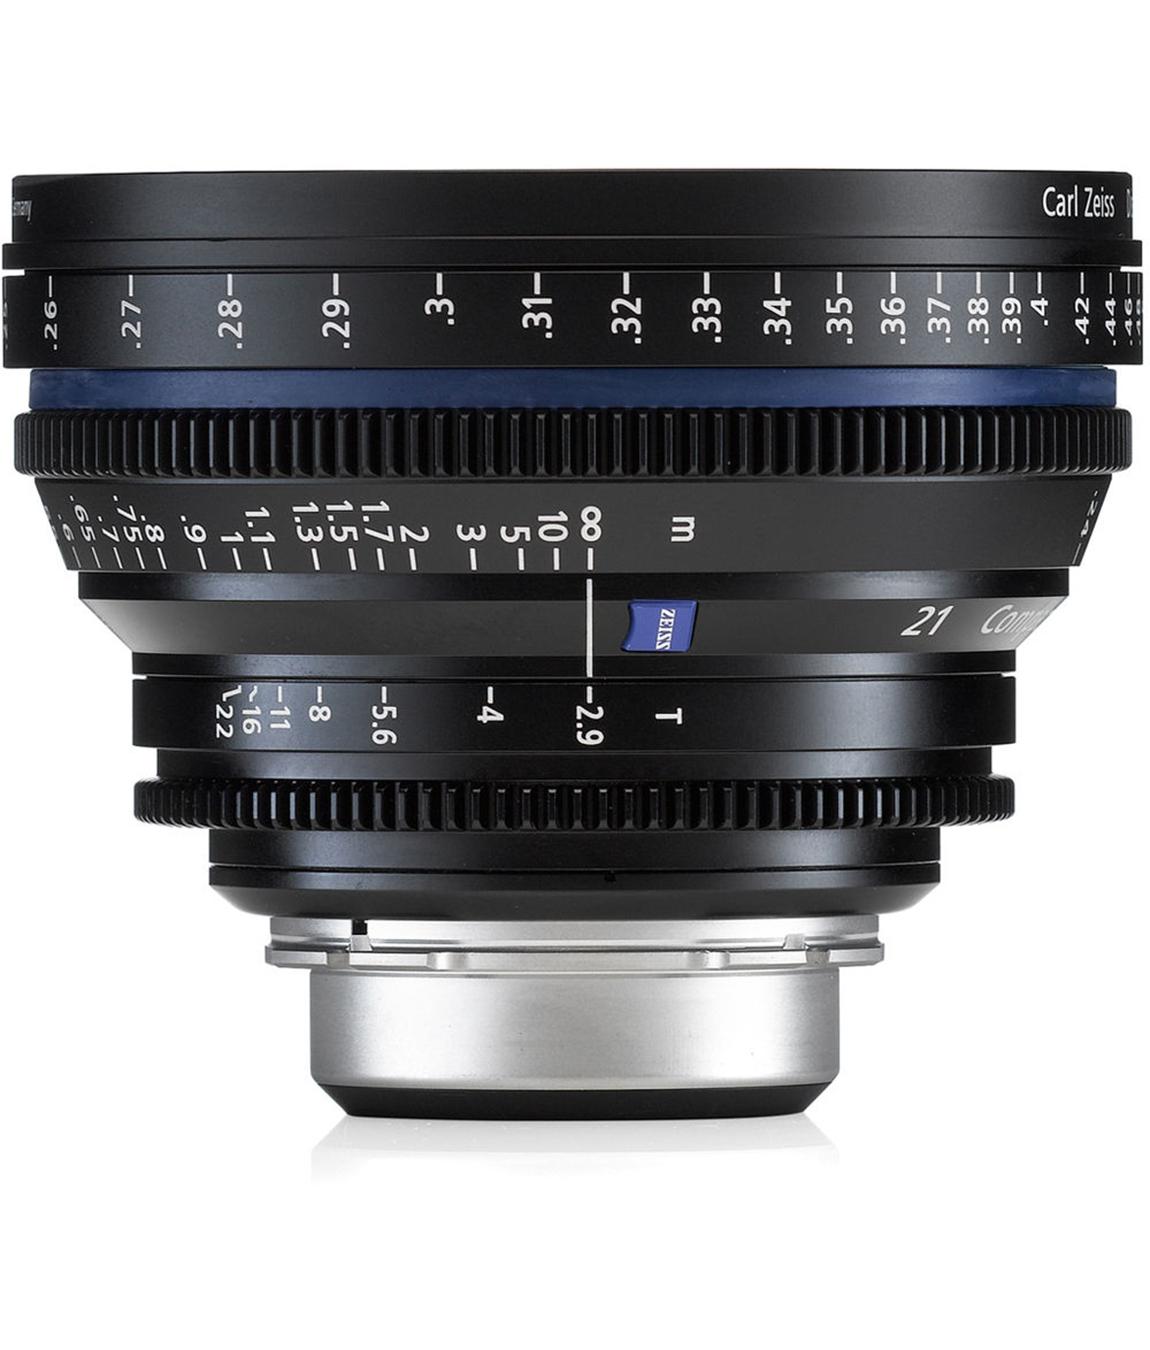 Carl Zeiss CP.2 21mm T2.9 EF Lens Rental NYC